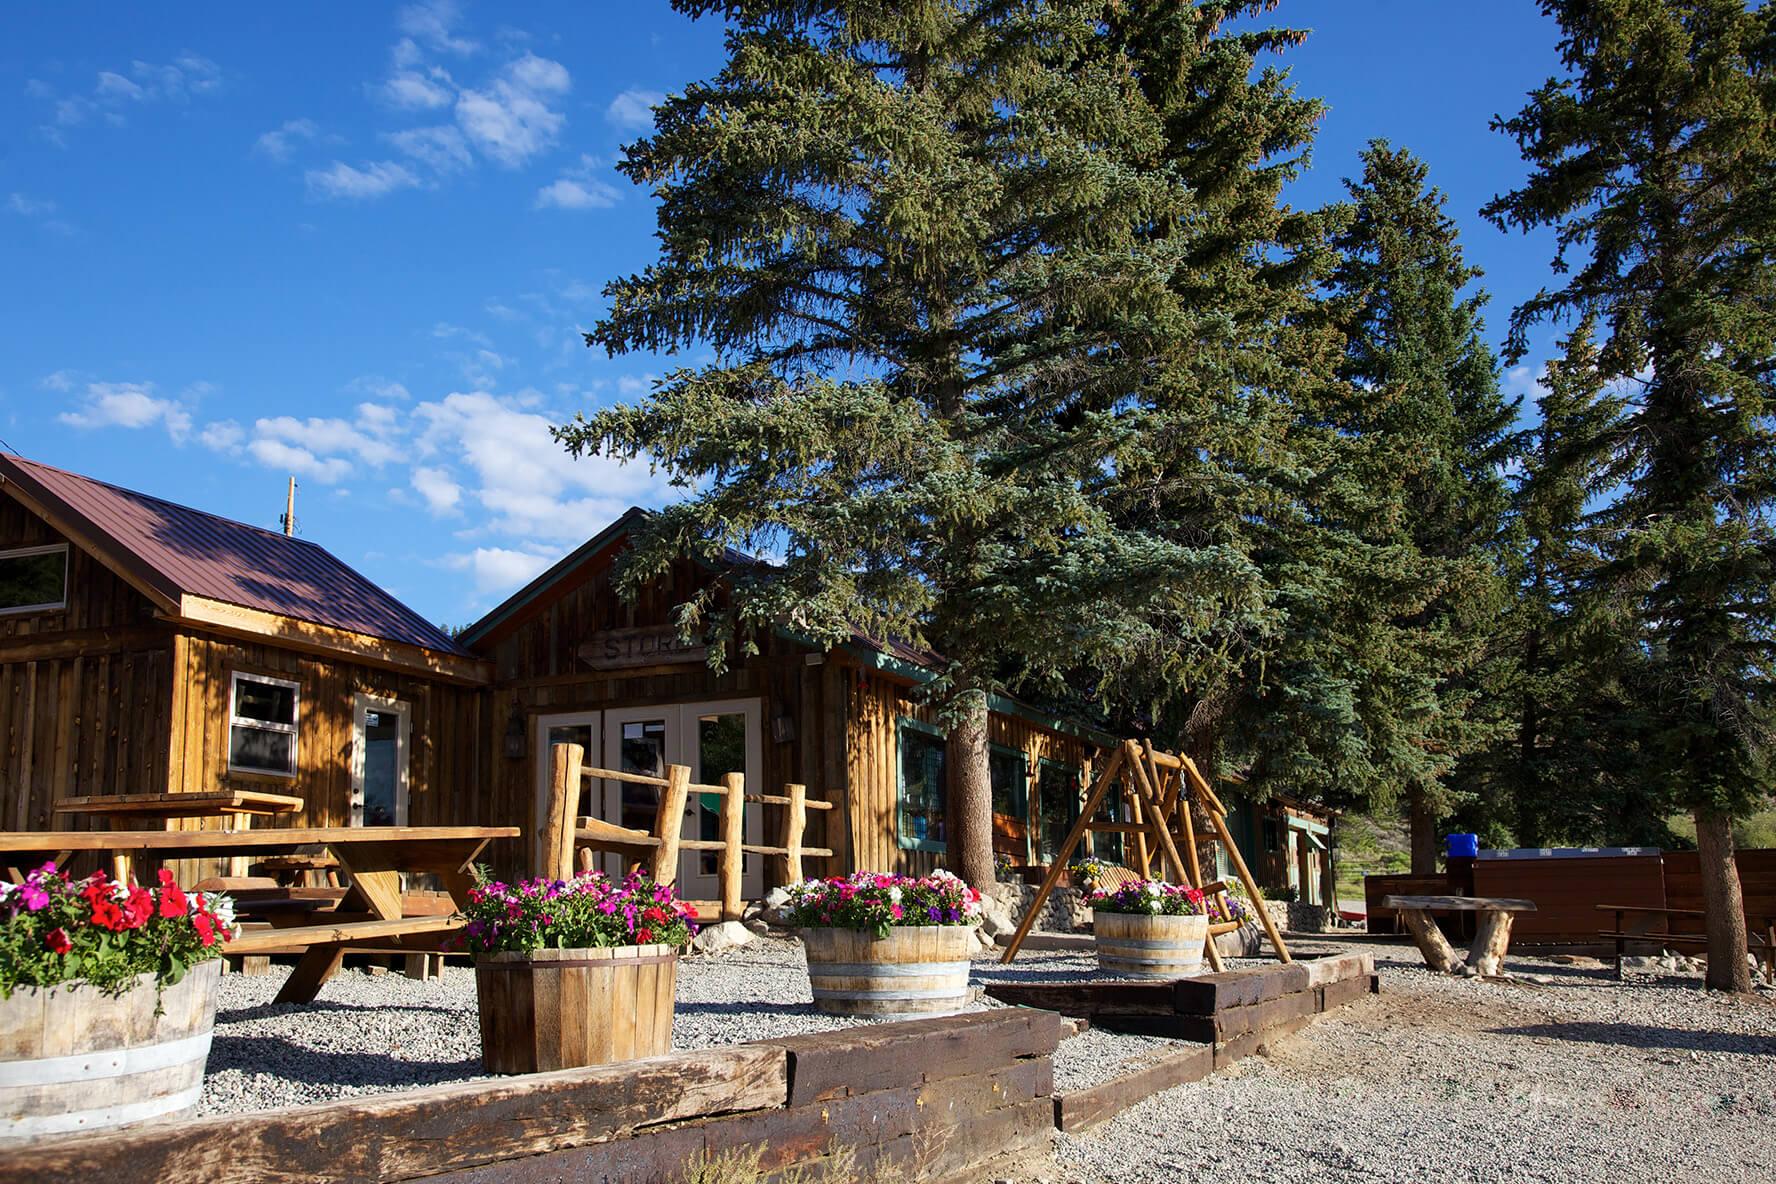 rw log breckenridge colorado rails and restoration repair cabin railing home deck cabins